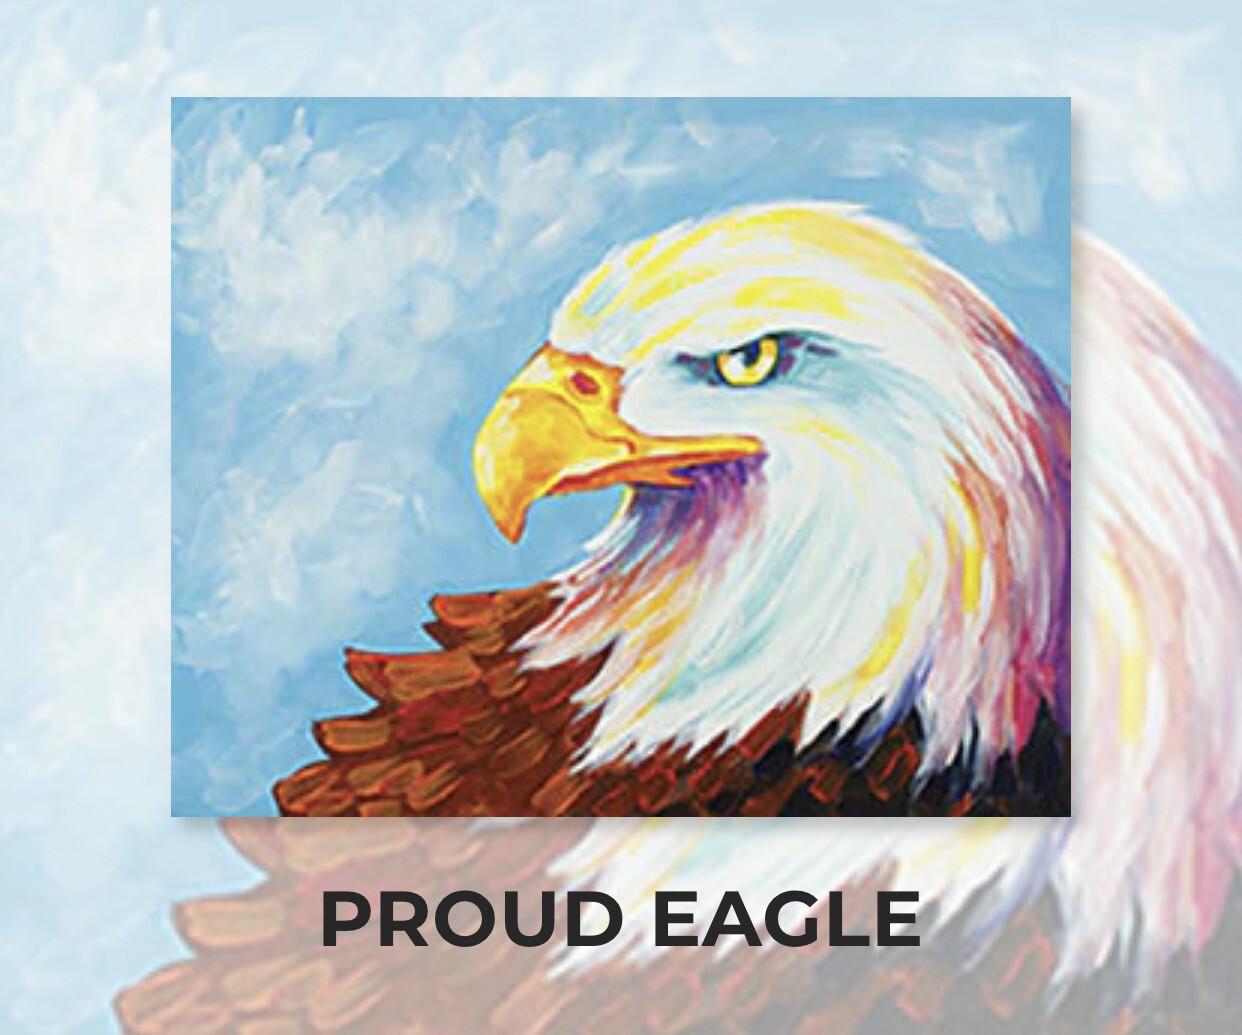 Proud Eagle ADULT Acrylic Paint On Canvas DIY Art Kit - 3 Week Special Order